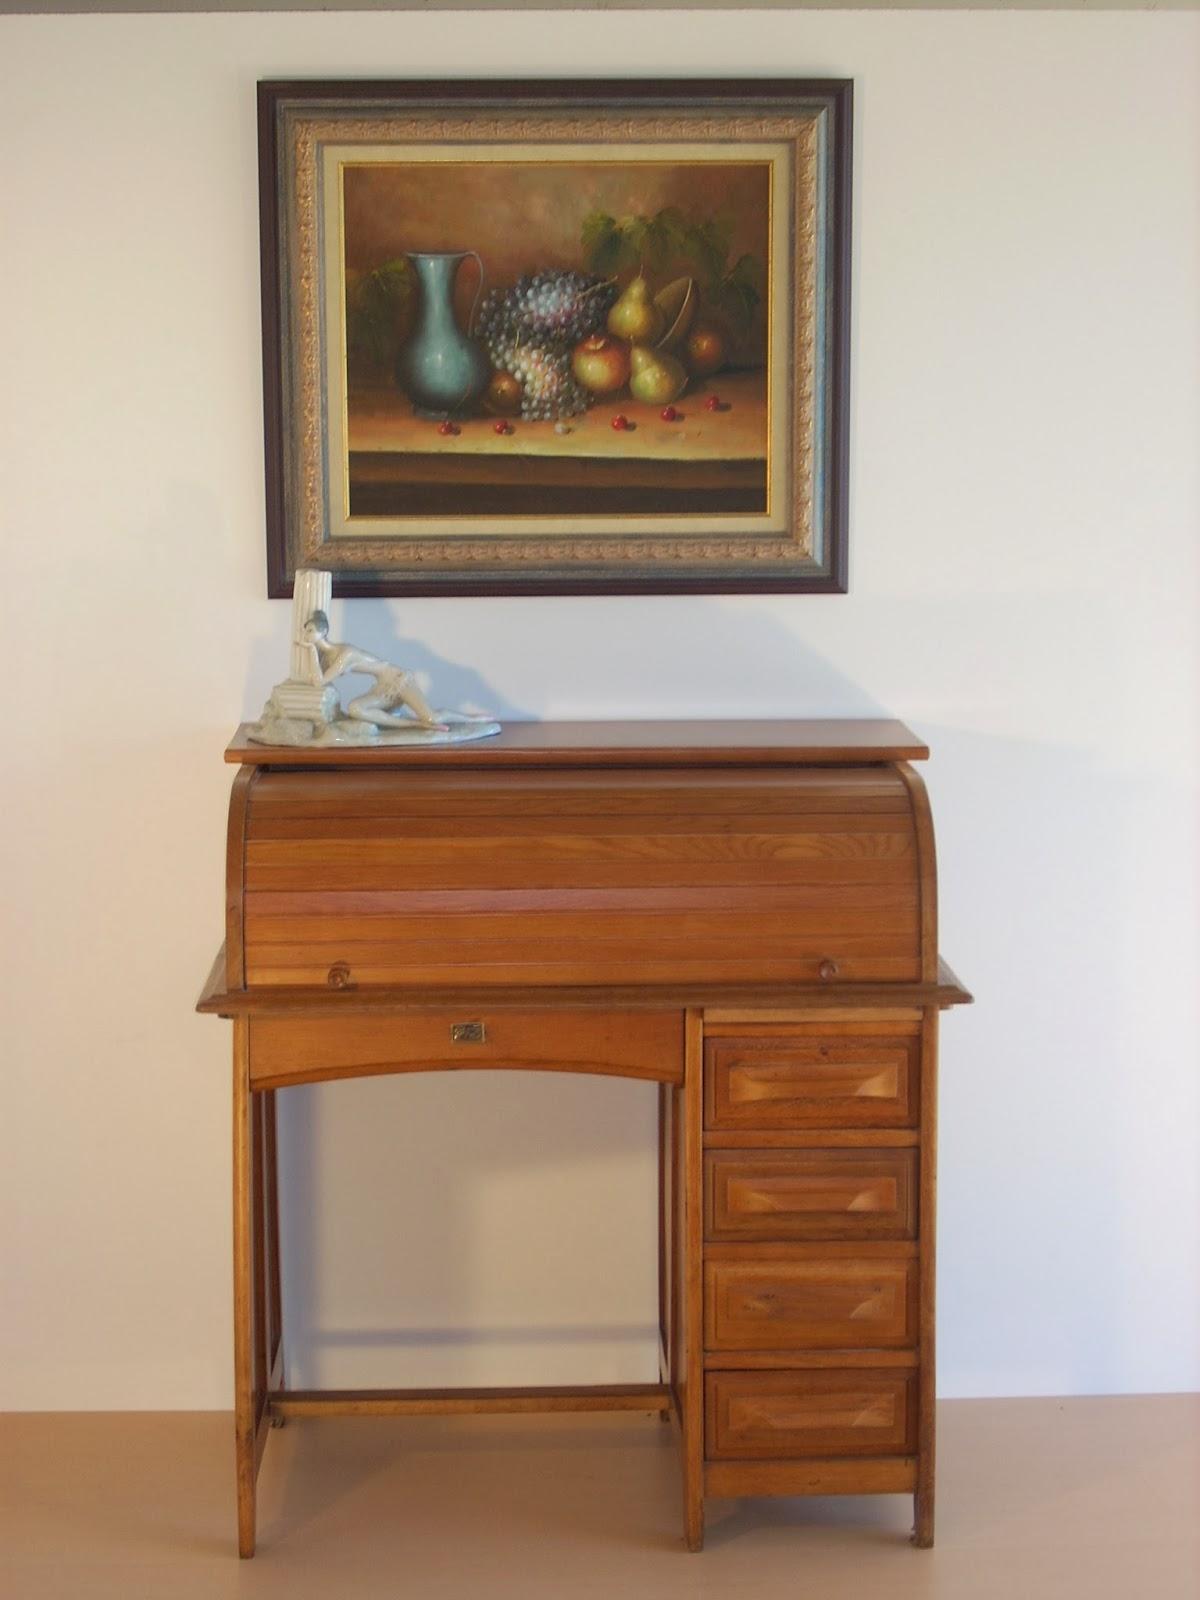 Venta de muebles antiguos restaurados naturmoble mesa de - Comprar muebles antiguos ...